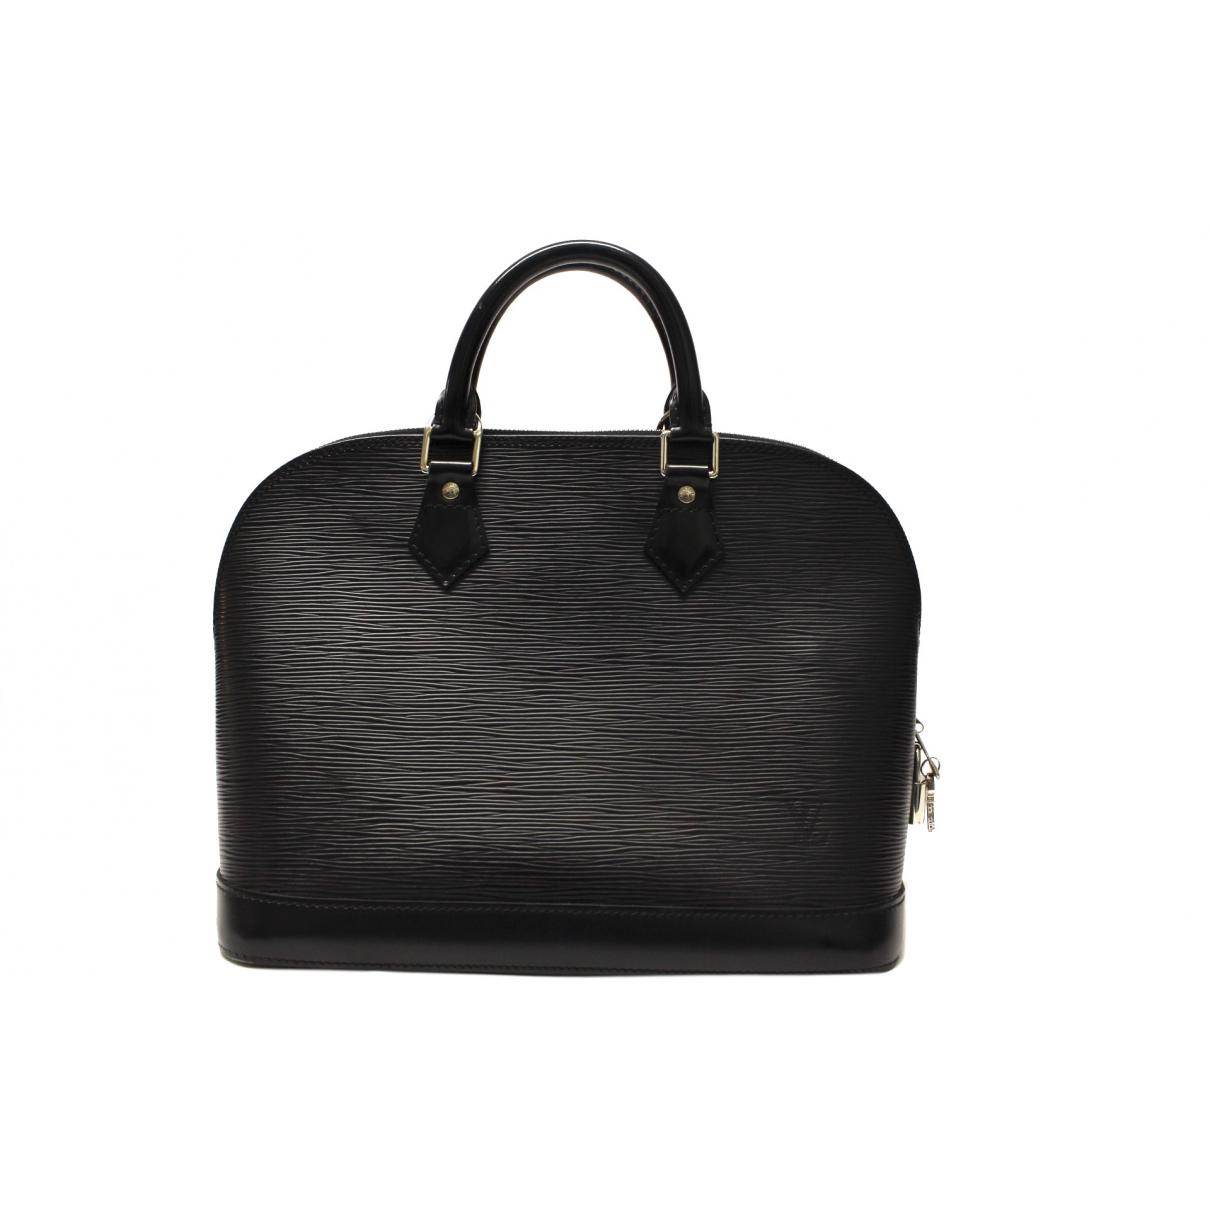 Louis Vuitton Alma Black Leather handbag for Women \N